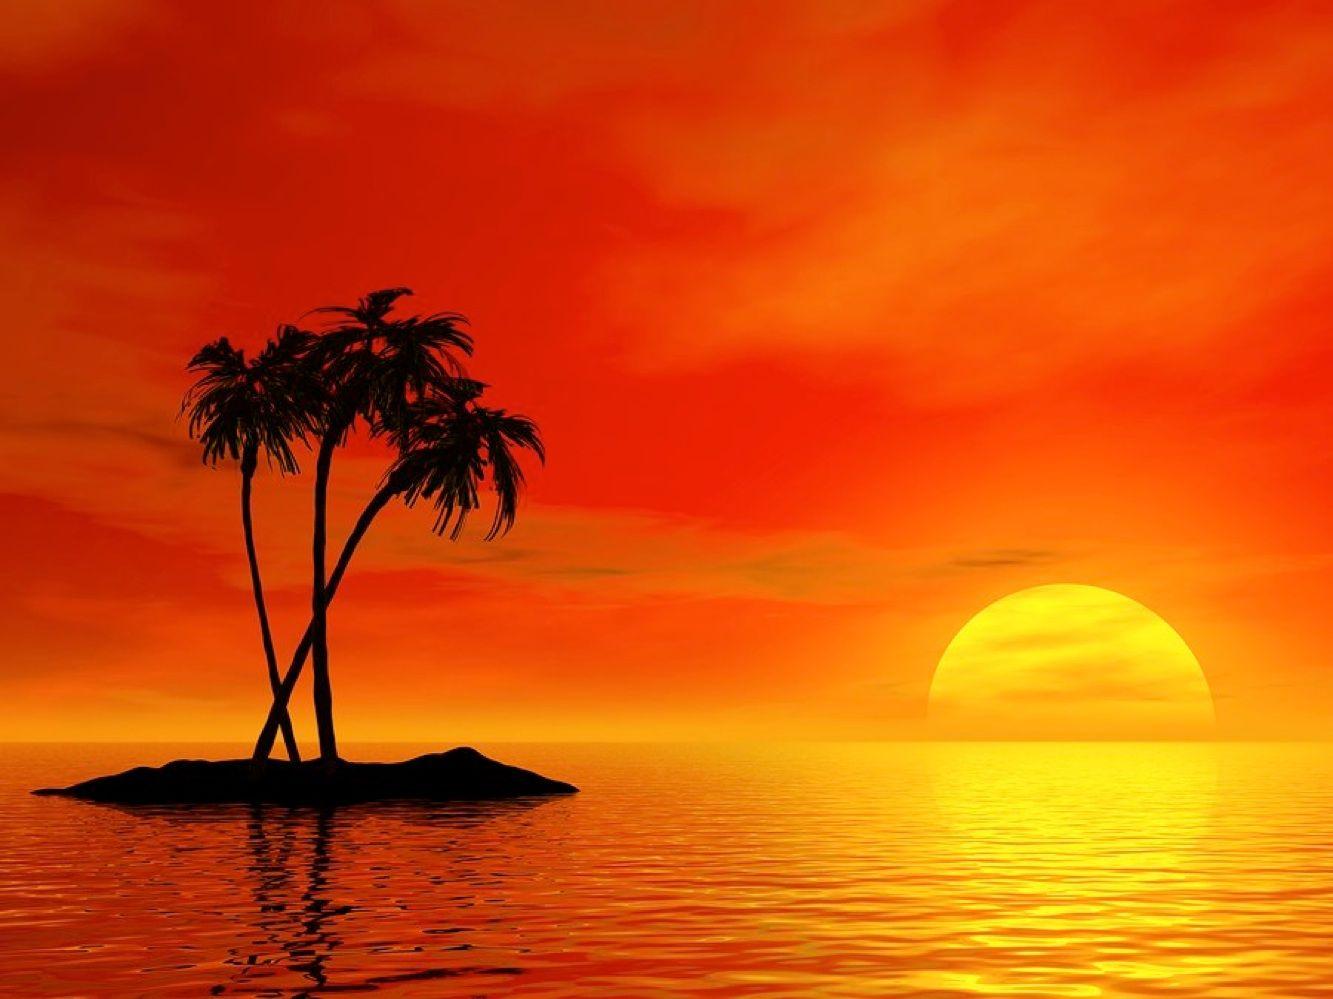 tropical sunset palm tree - photo #12